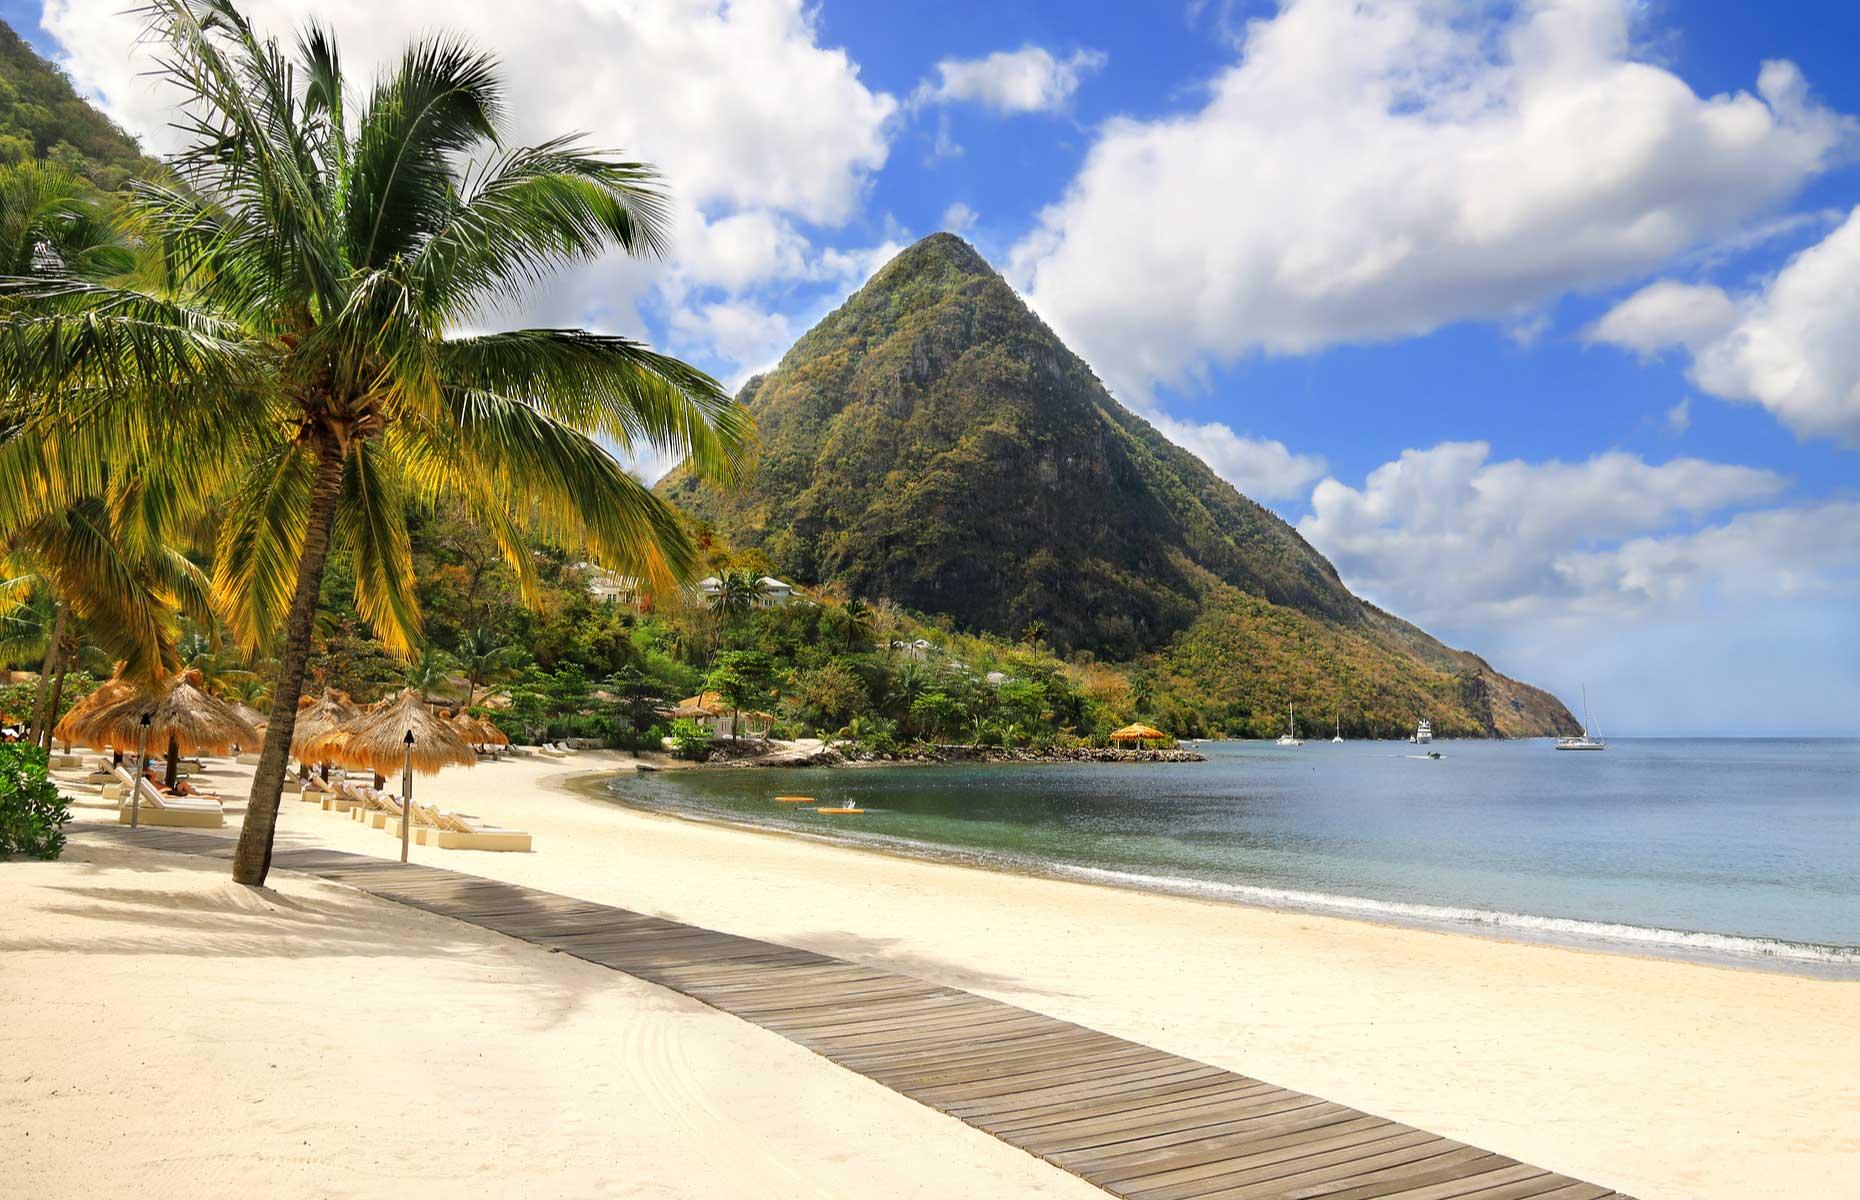 Sugar loaf beach (Image: Inga Locmele/Shutterstock)